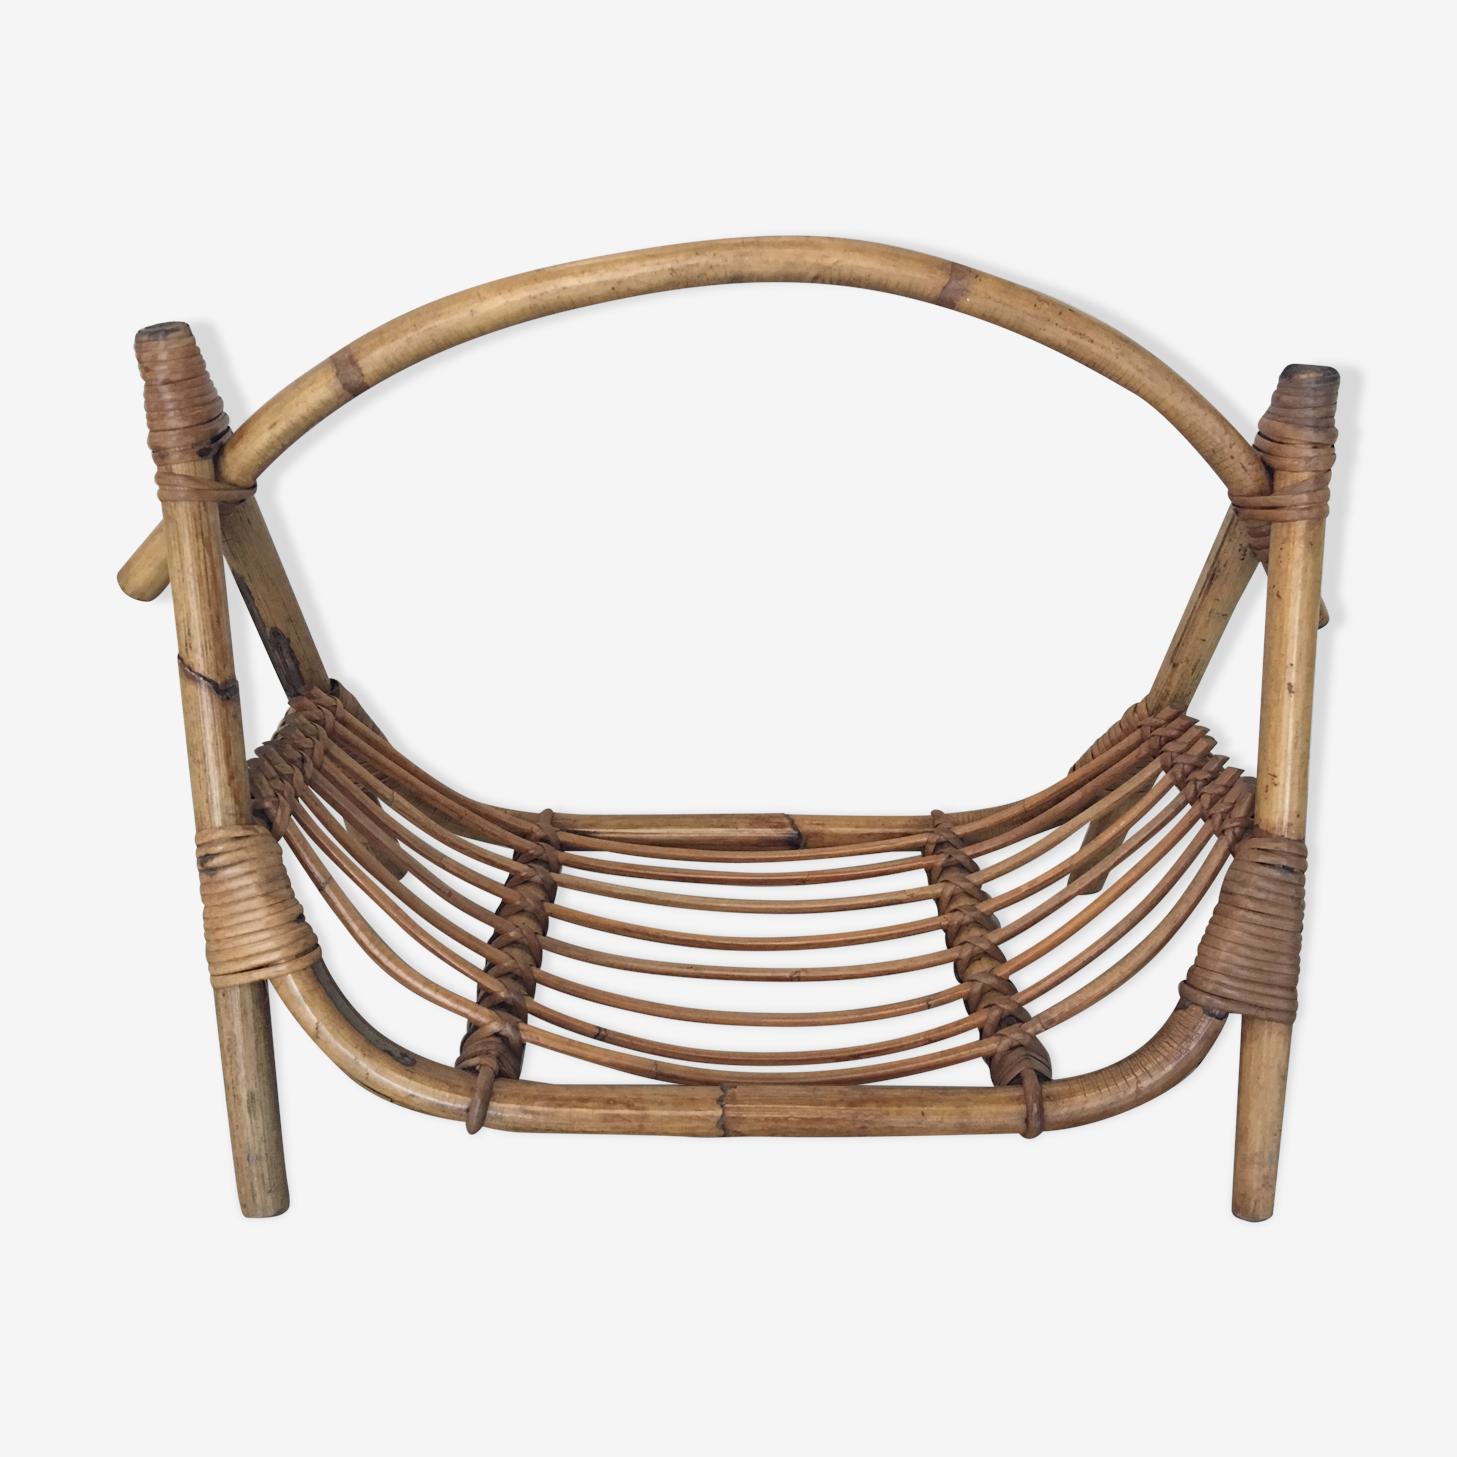 Porte revues bambou 1960